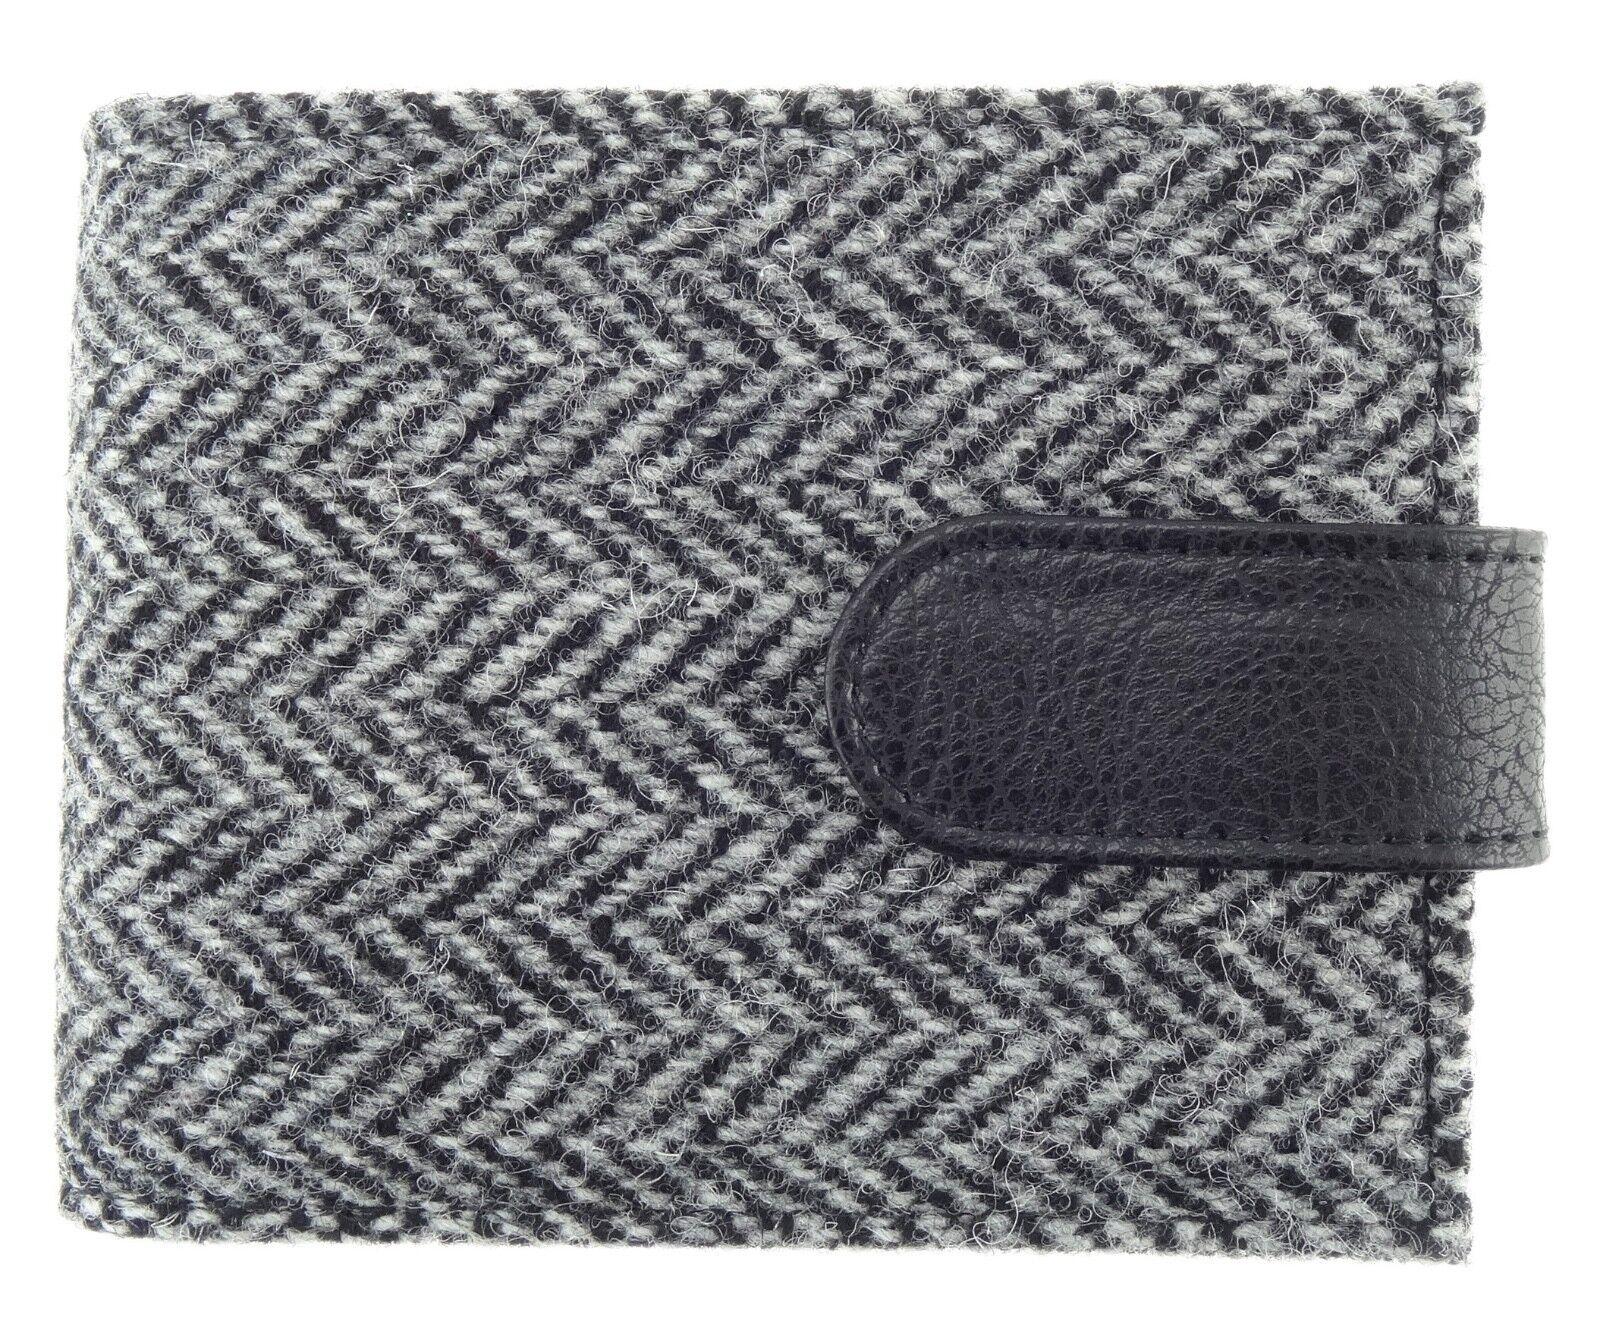 Authentic Harris Tweed Gents Coin Wallet Black/White Herringbone LB2105 - COL 4